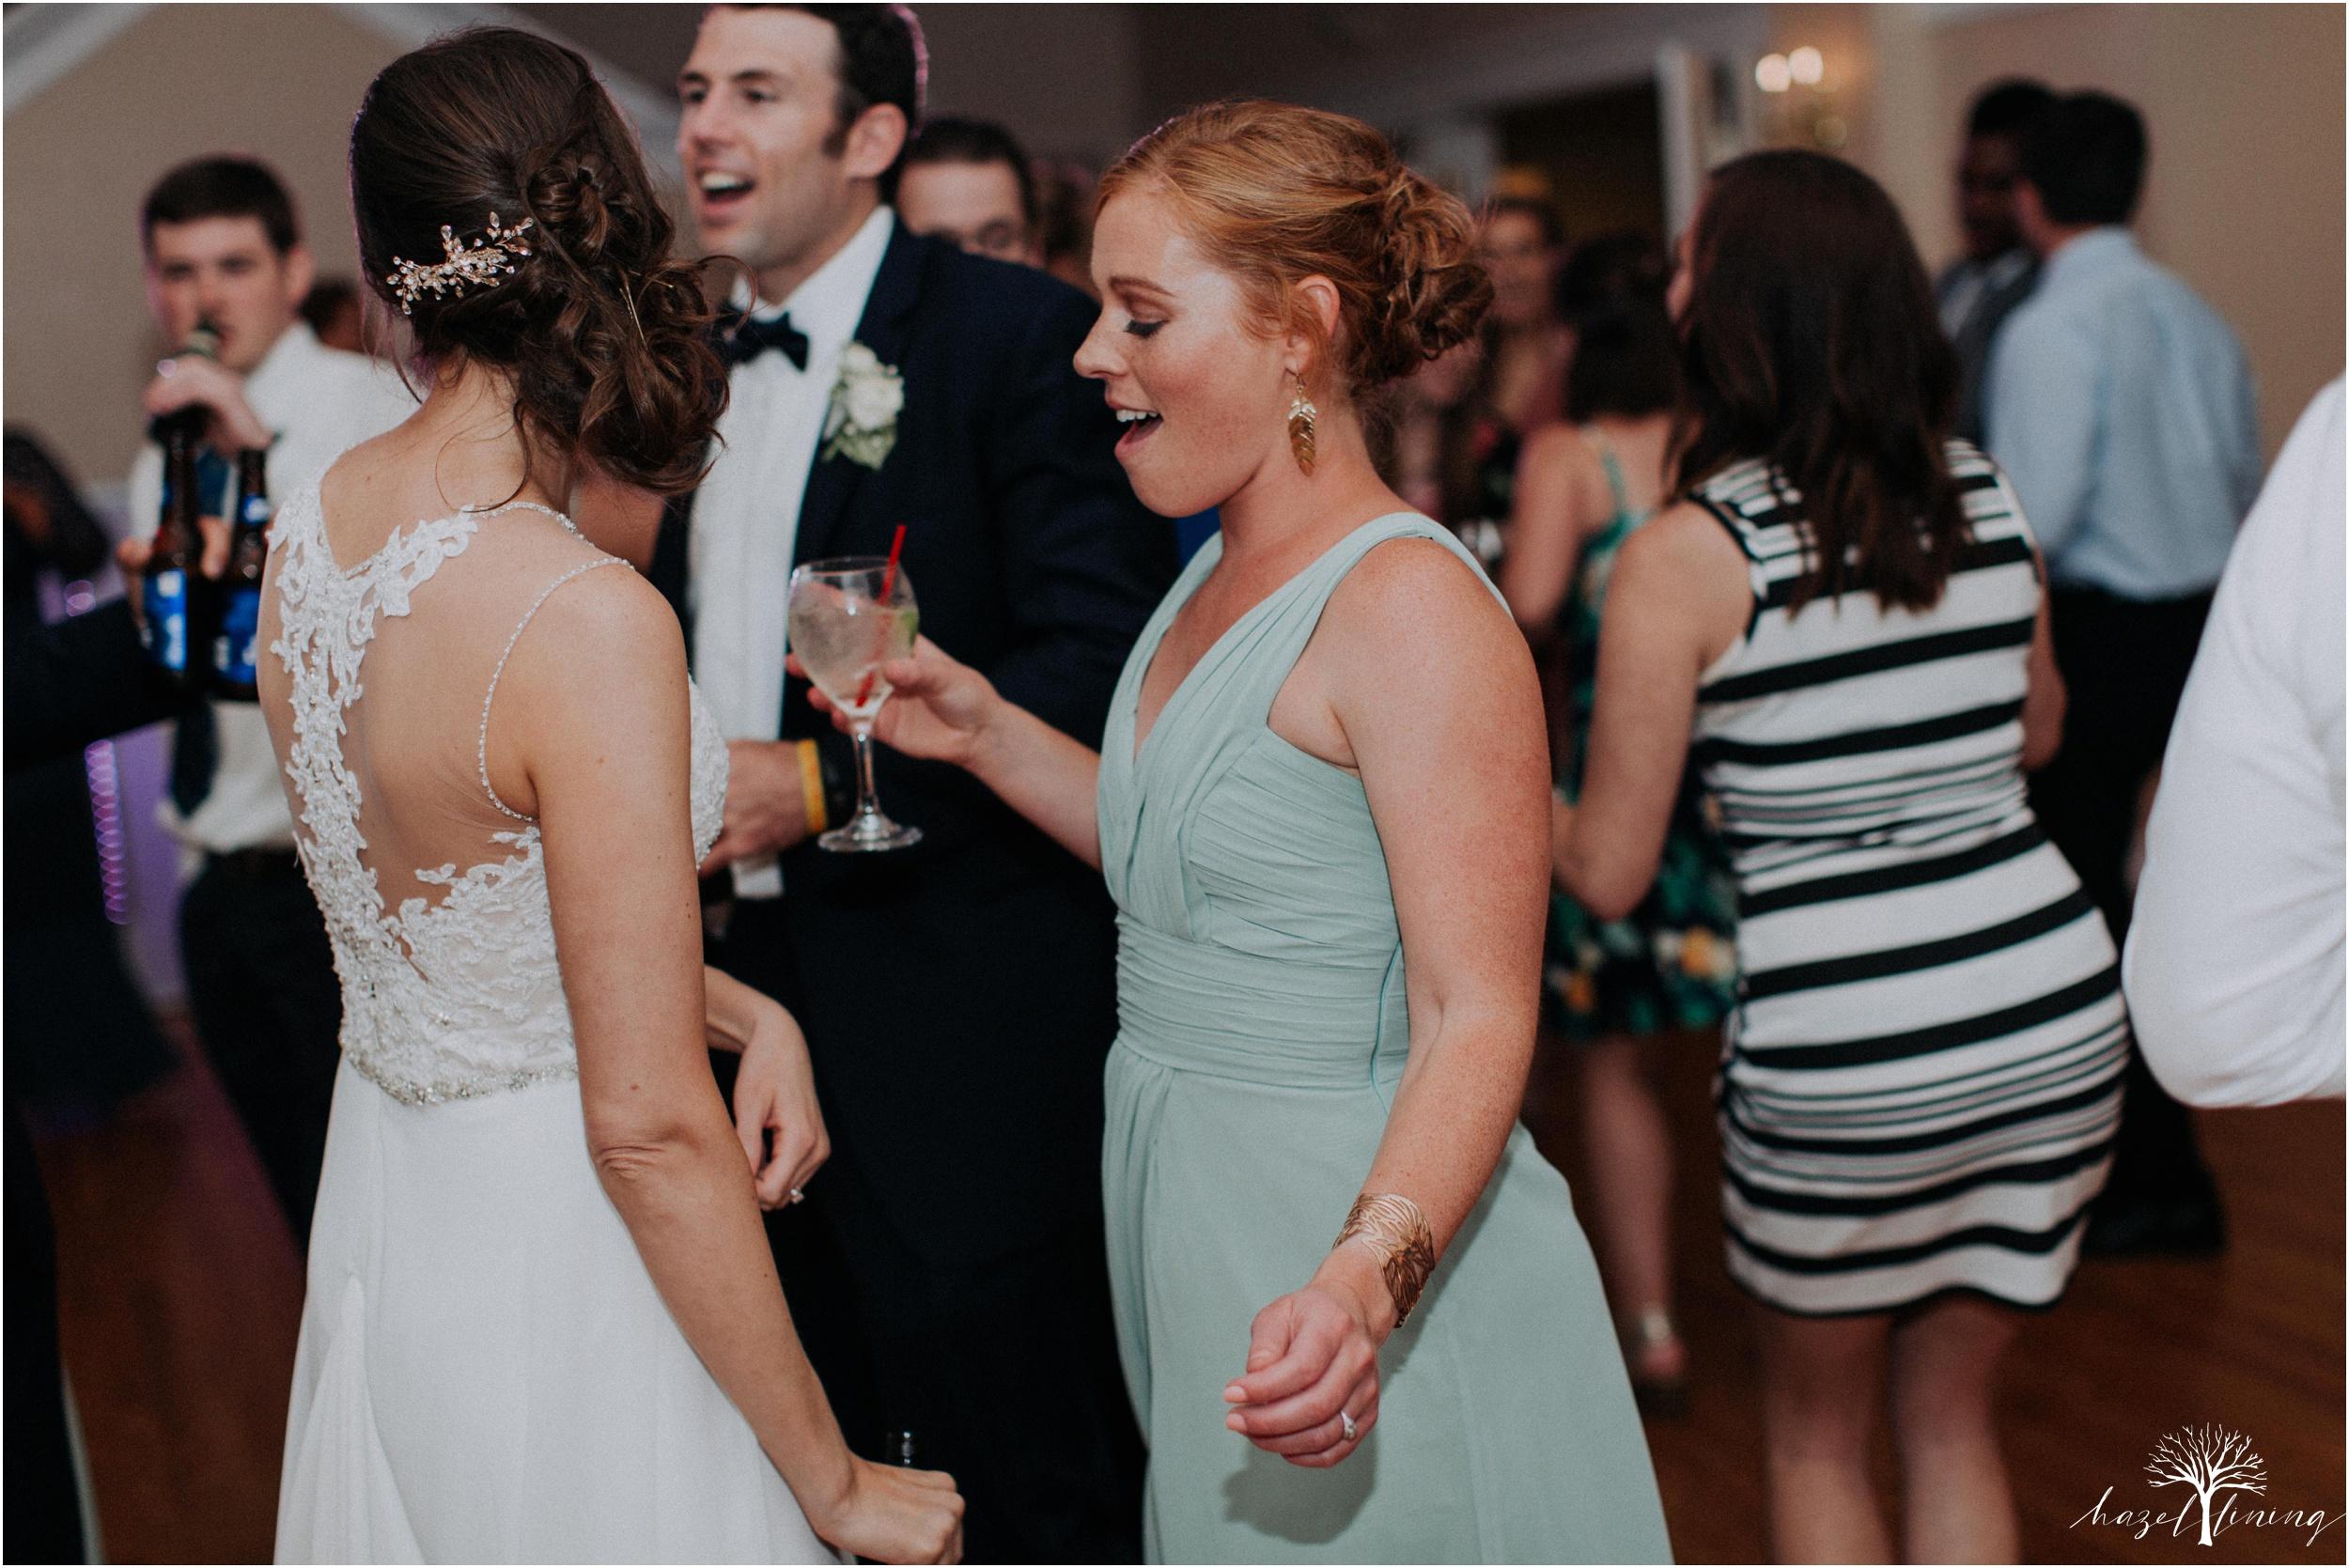 hazel-lining-travel-wedding-elopement-photography_0153.jpg